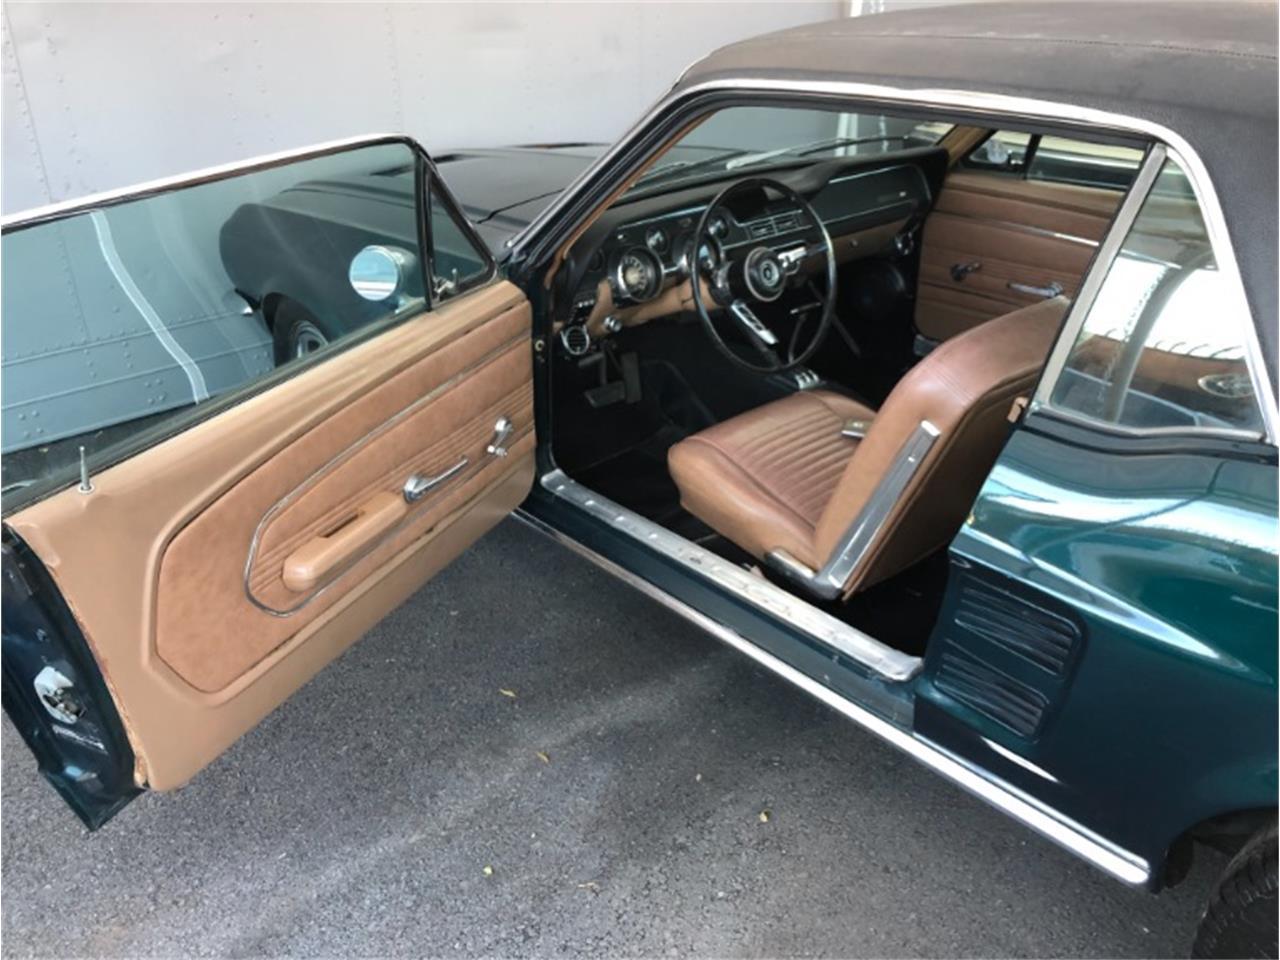 Ford Mustang 1ére main v8 289 1967 prix tout compris